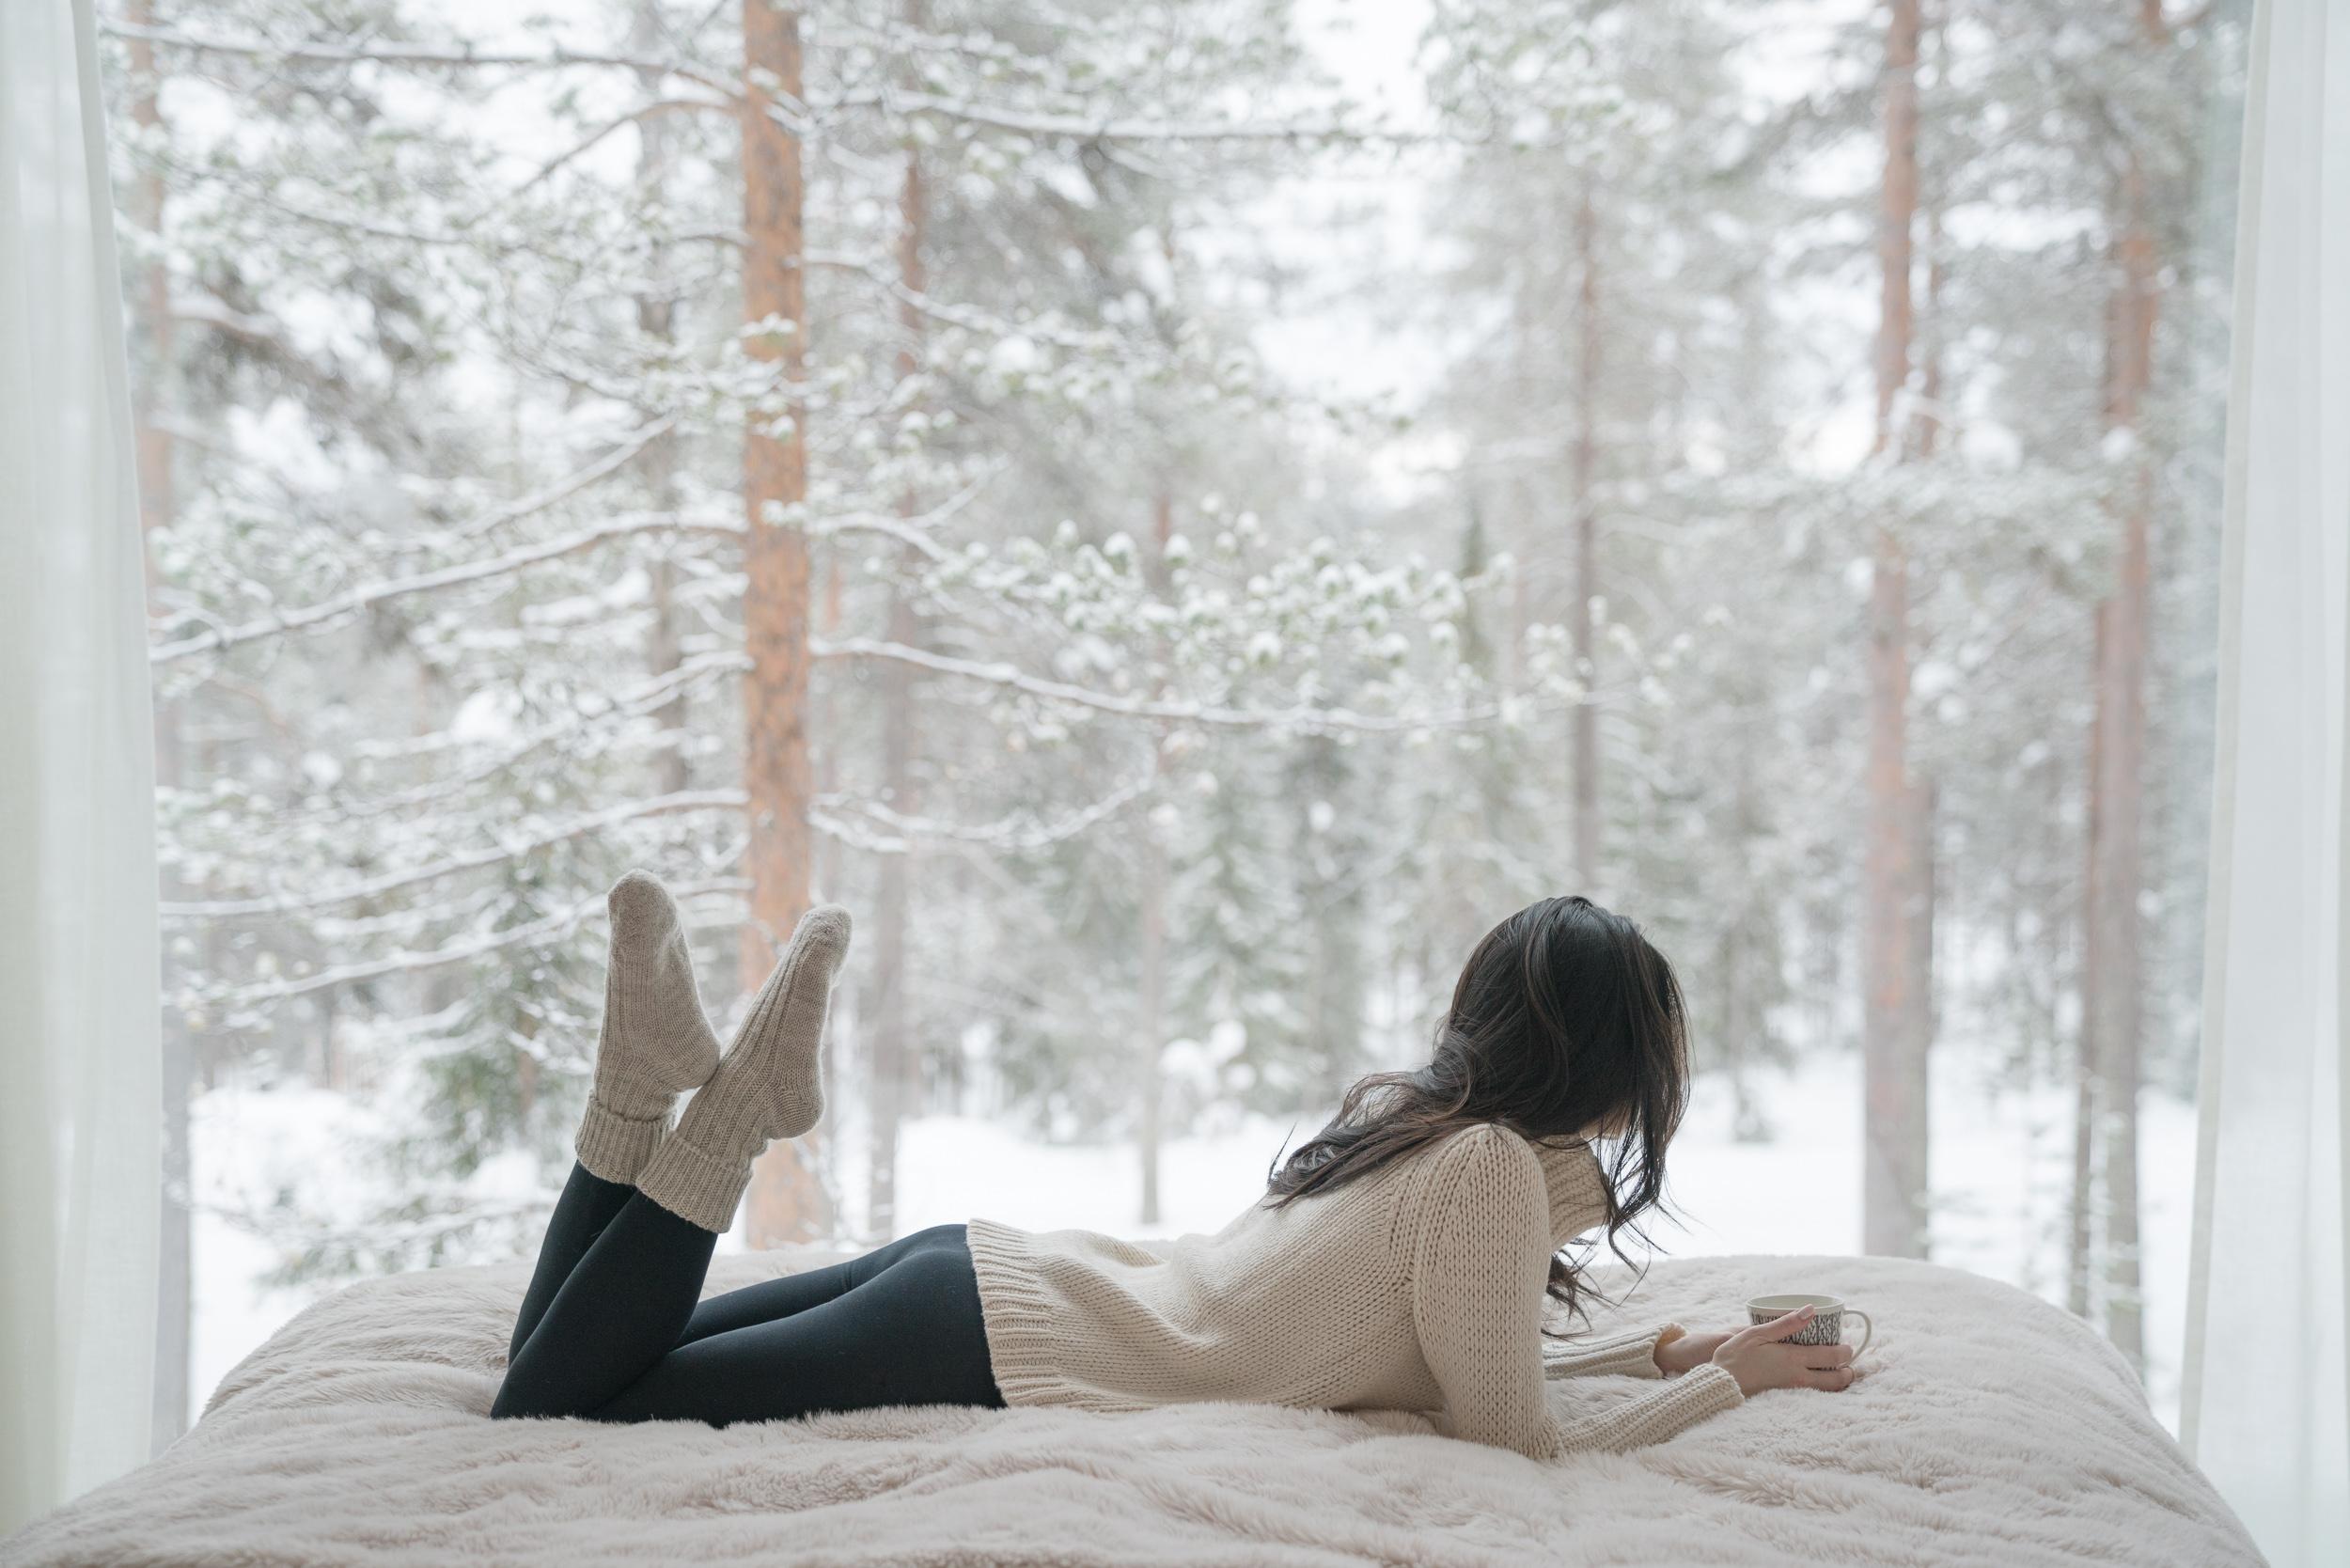 the_getaway_edit_finland_rovaniemi_arctic_treehouse-7.jpg